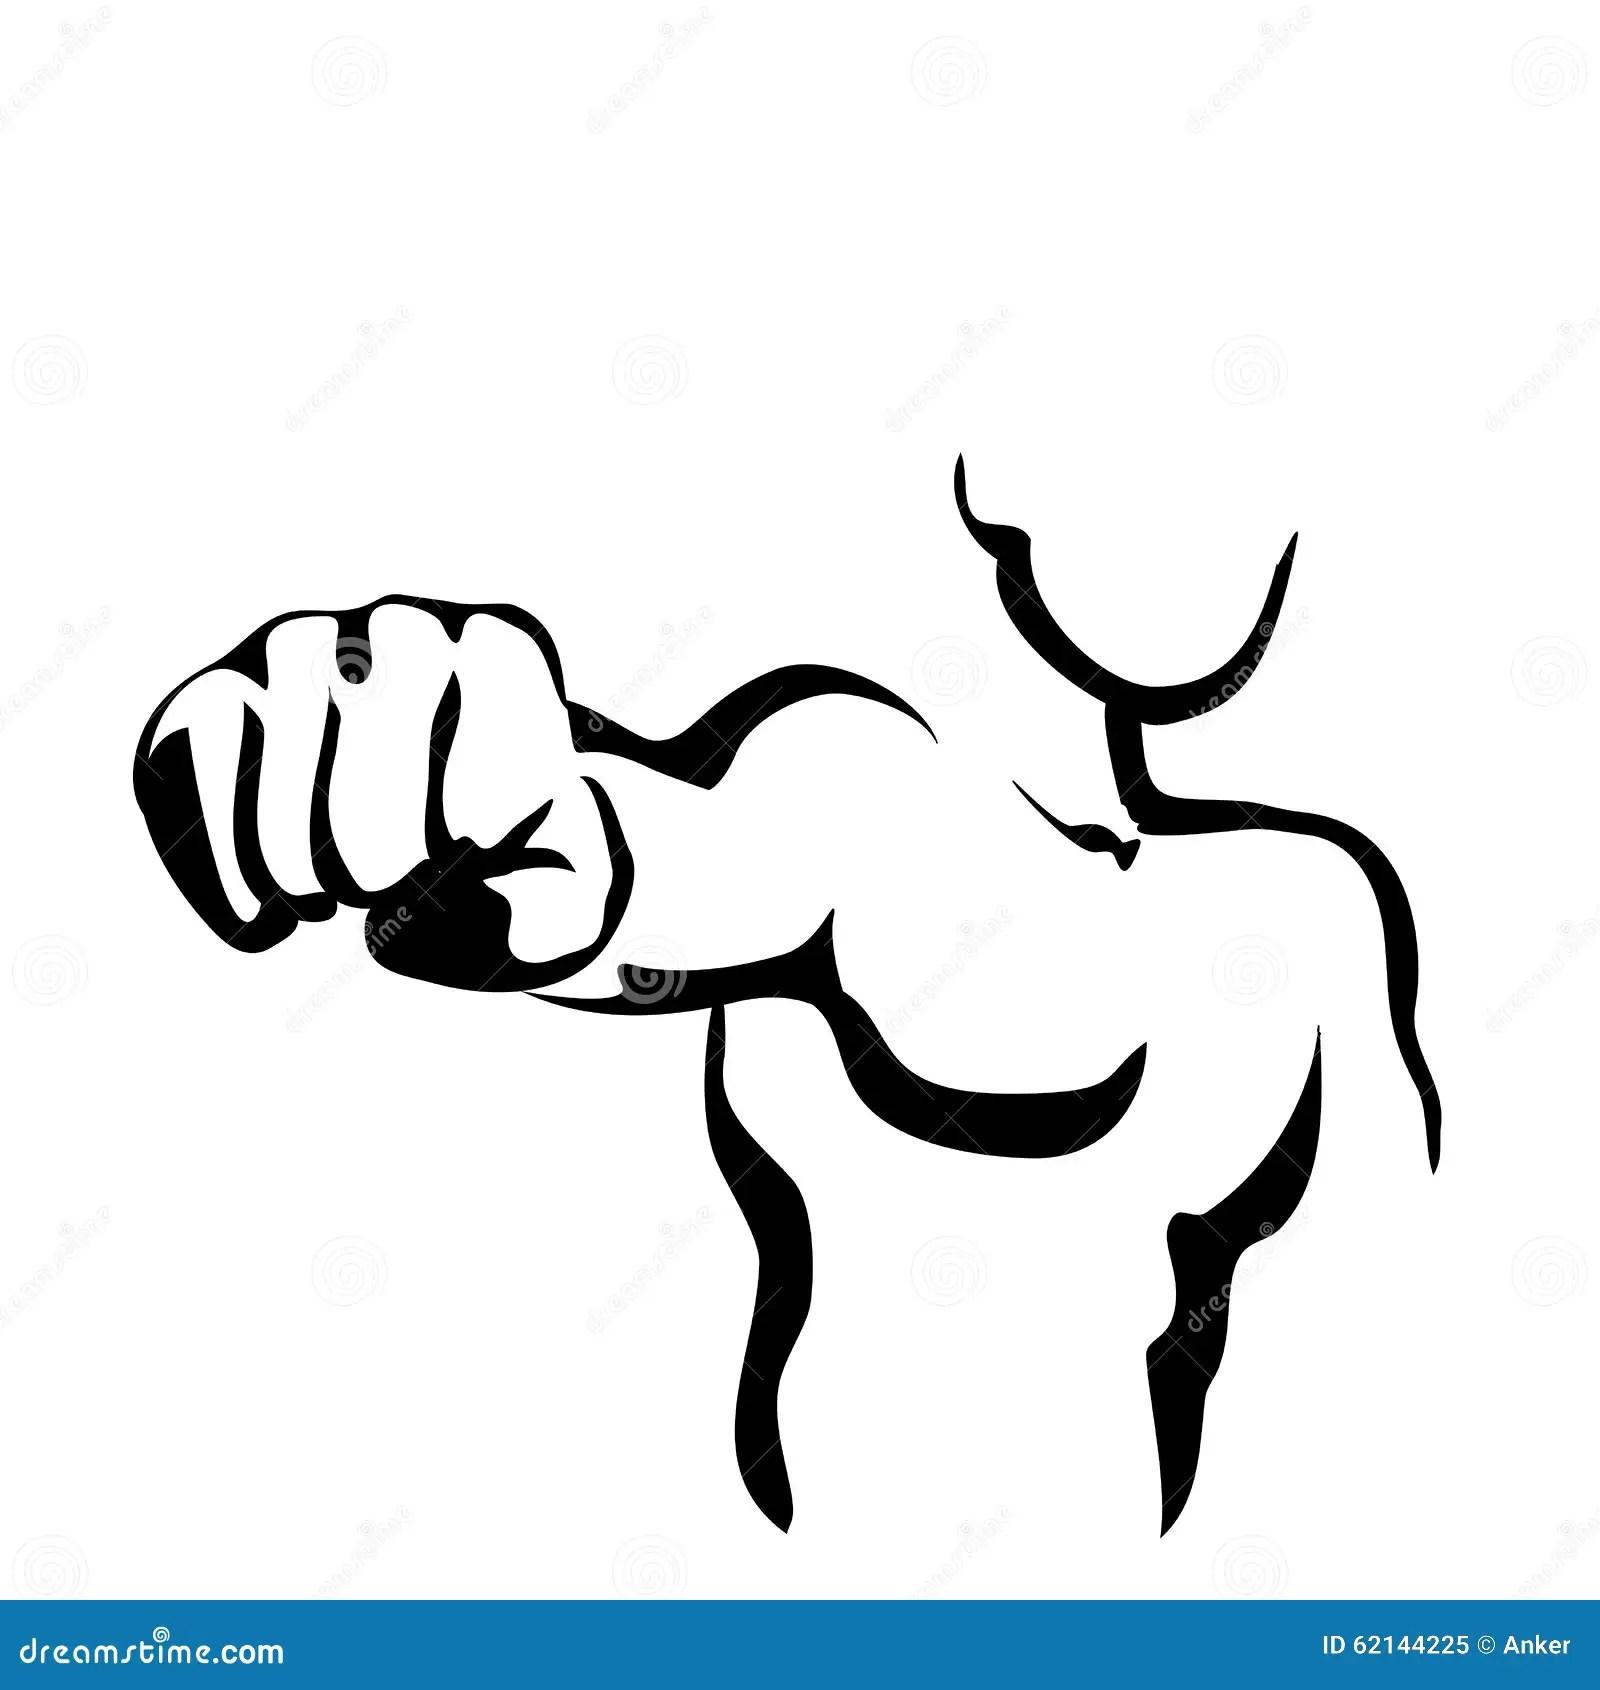 Fist Hand Draw Sketch Vector Cartoon Vector